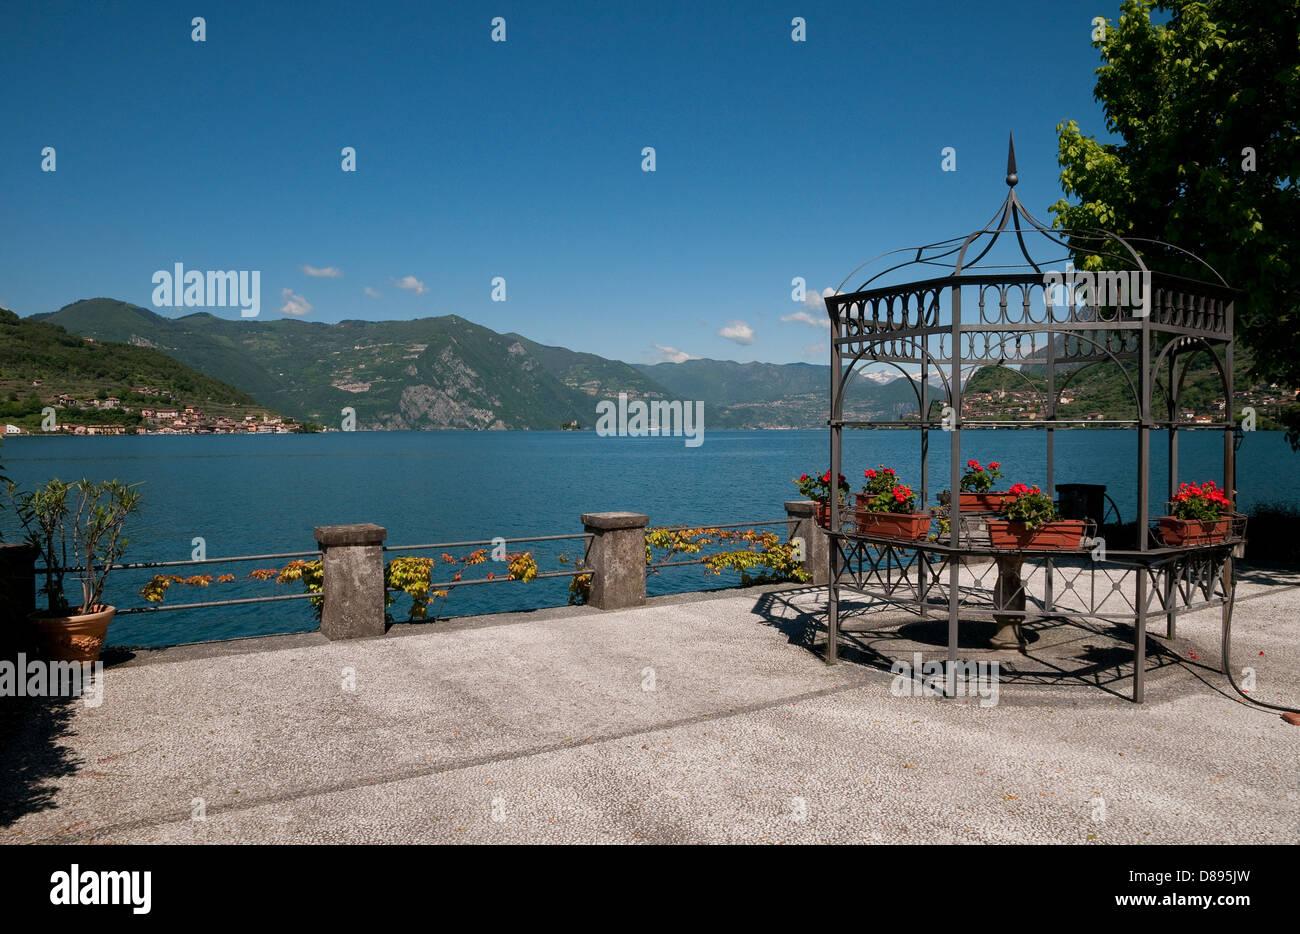 sale marasino, lake iseo, lombardy, italy - Stock Image